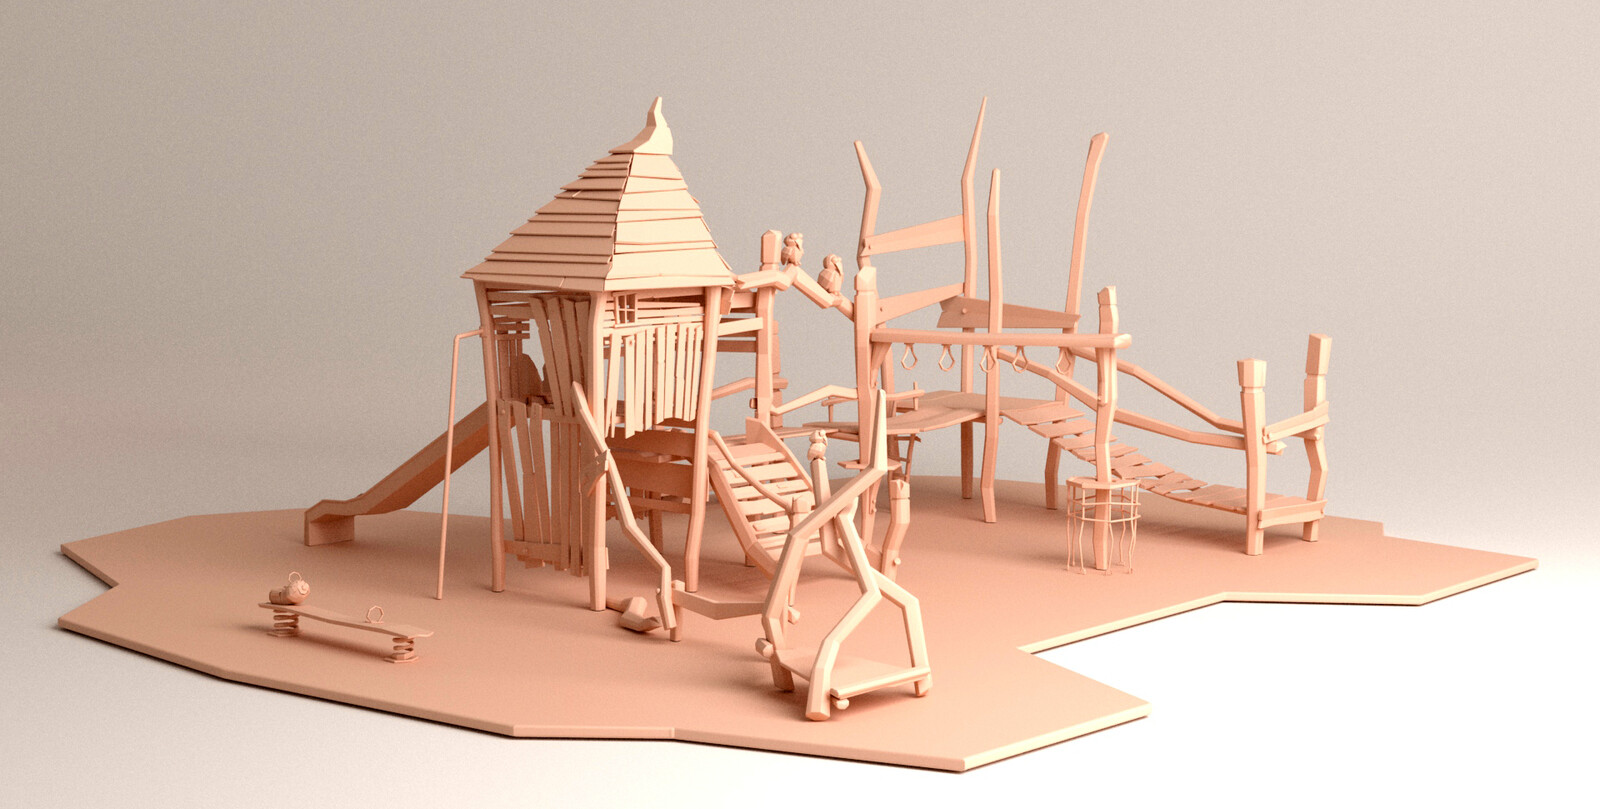 Playground Scene, 3D Model